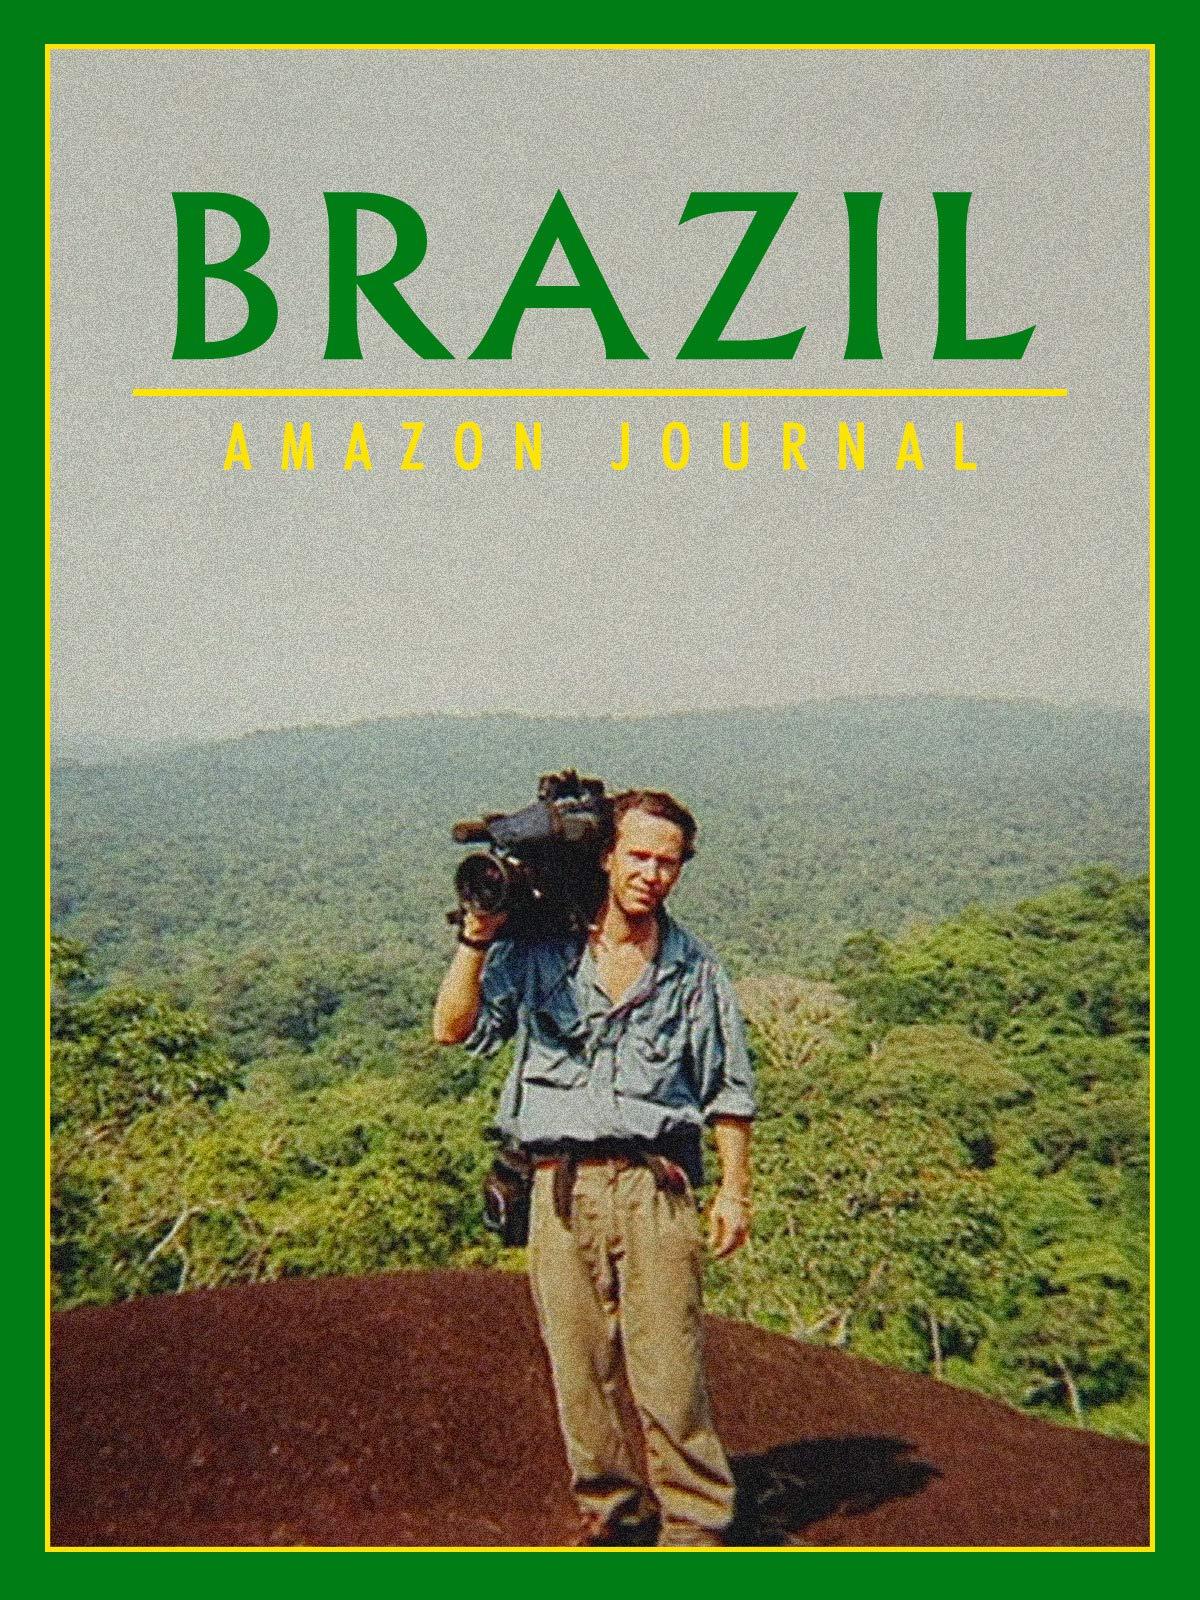 Brazil: Amazon Journal